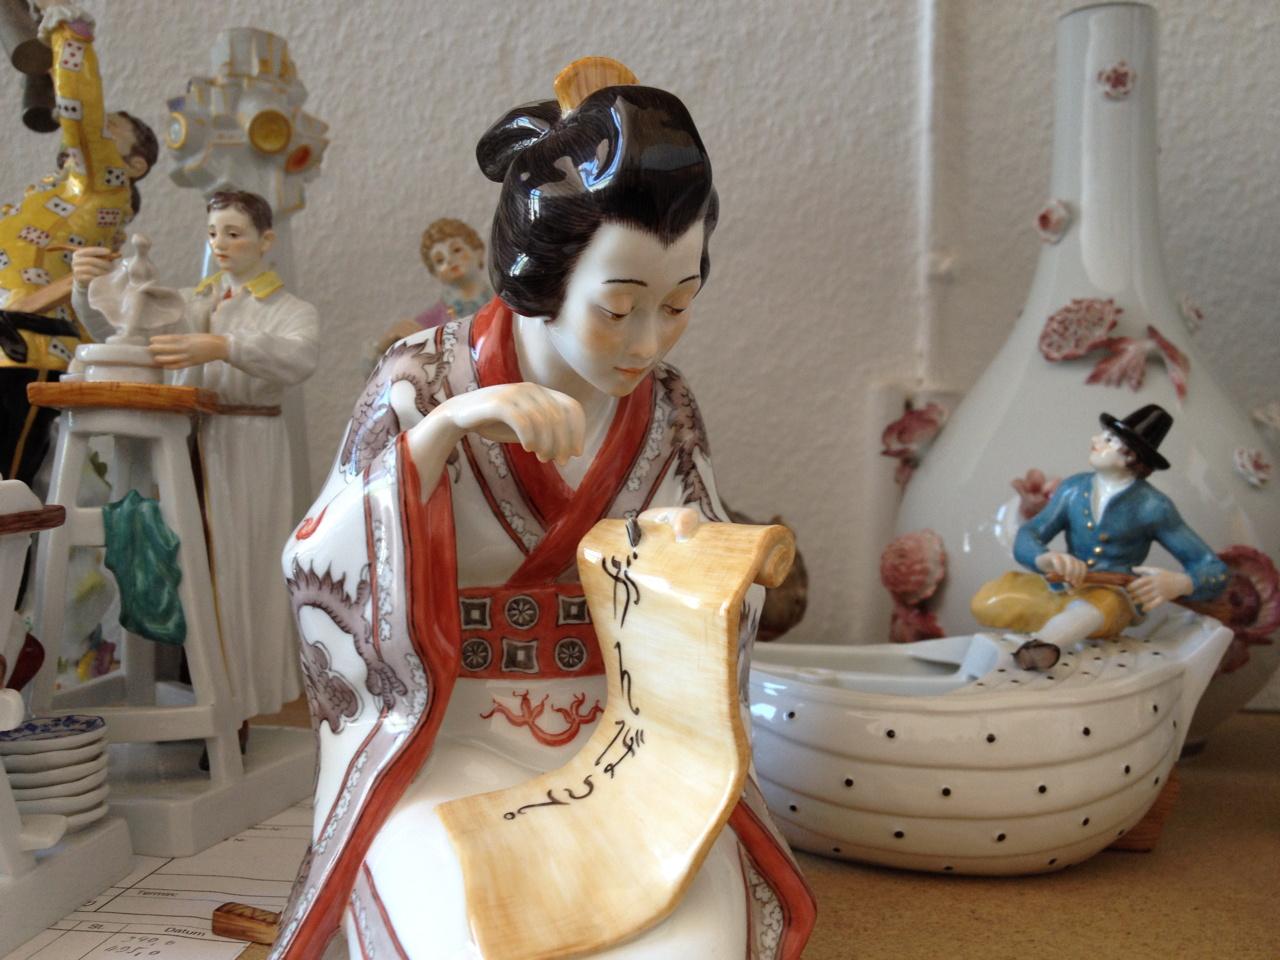 Porcelain figurines at Meissen (click to enlarge)